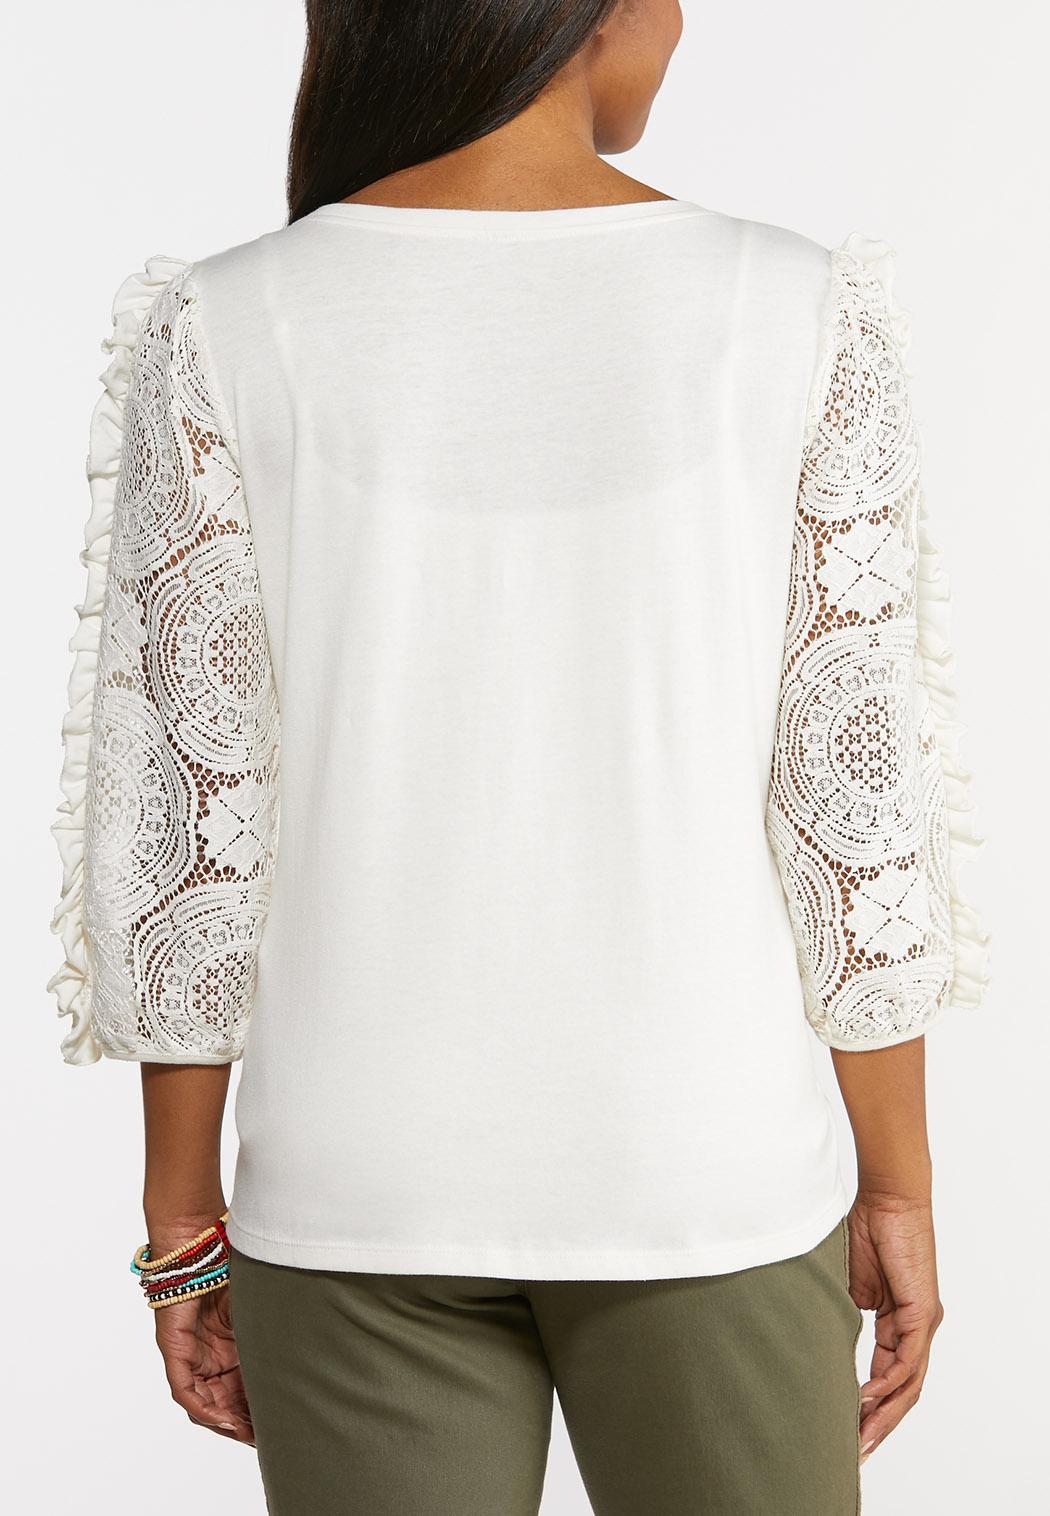 Lacy Ruffled Sleeve Top (Item #44327178)